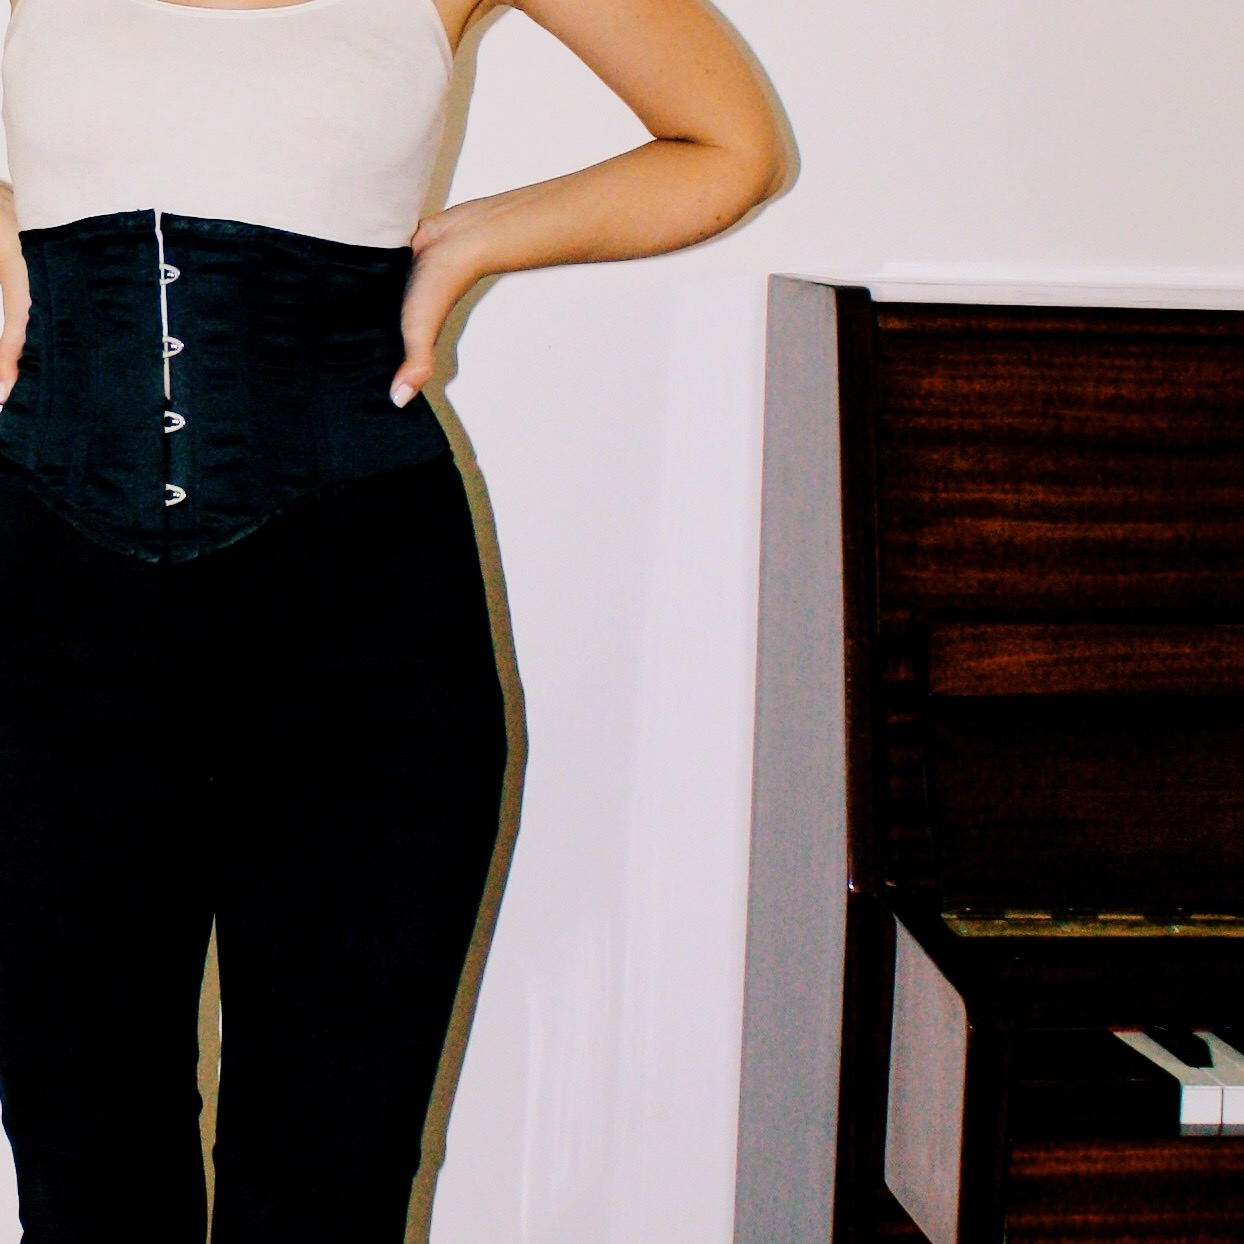 casual outfits manolo blahnik patent leather heels shoes suede pants piano white tank fur stole jacket corset belt 4